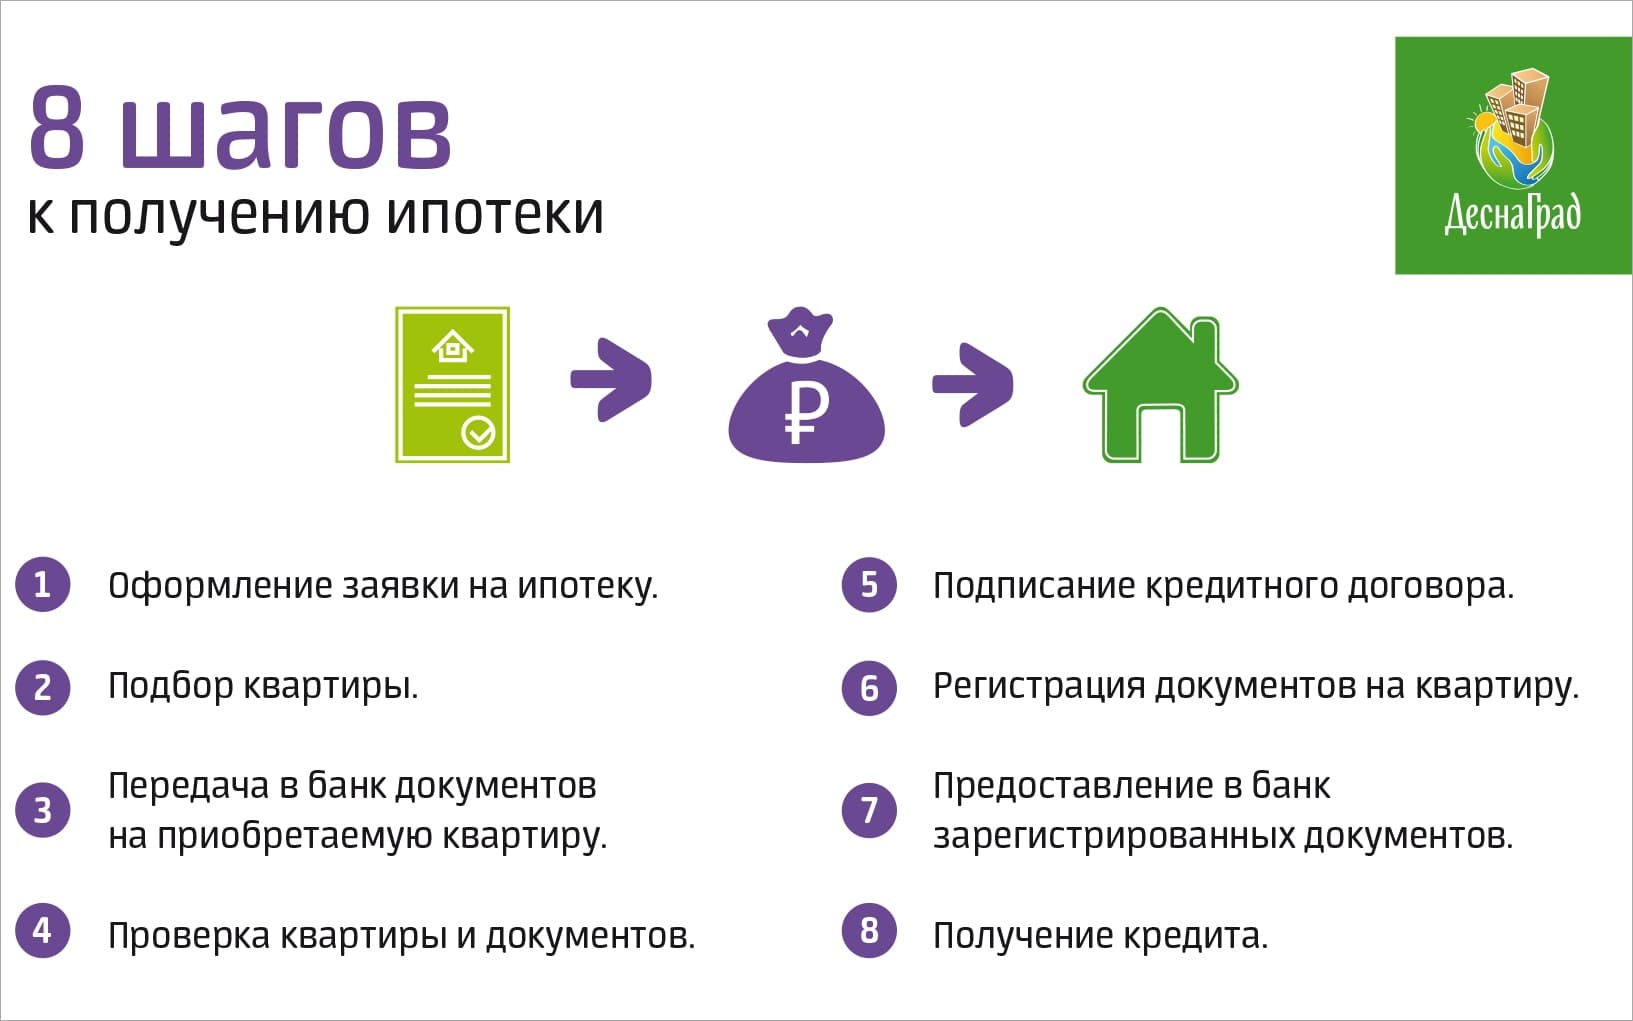 кредитная карта от тинькофф банка 120 дней без процентов условия